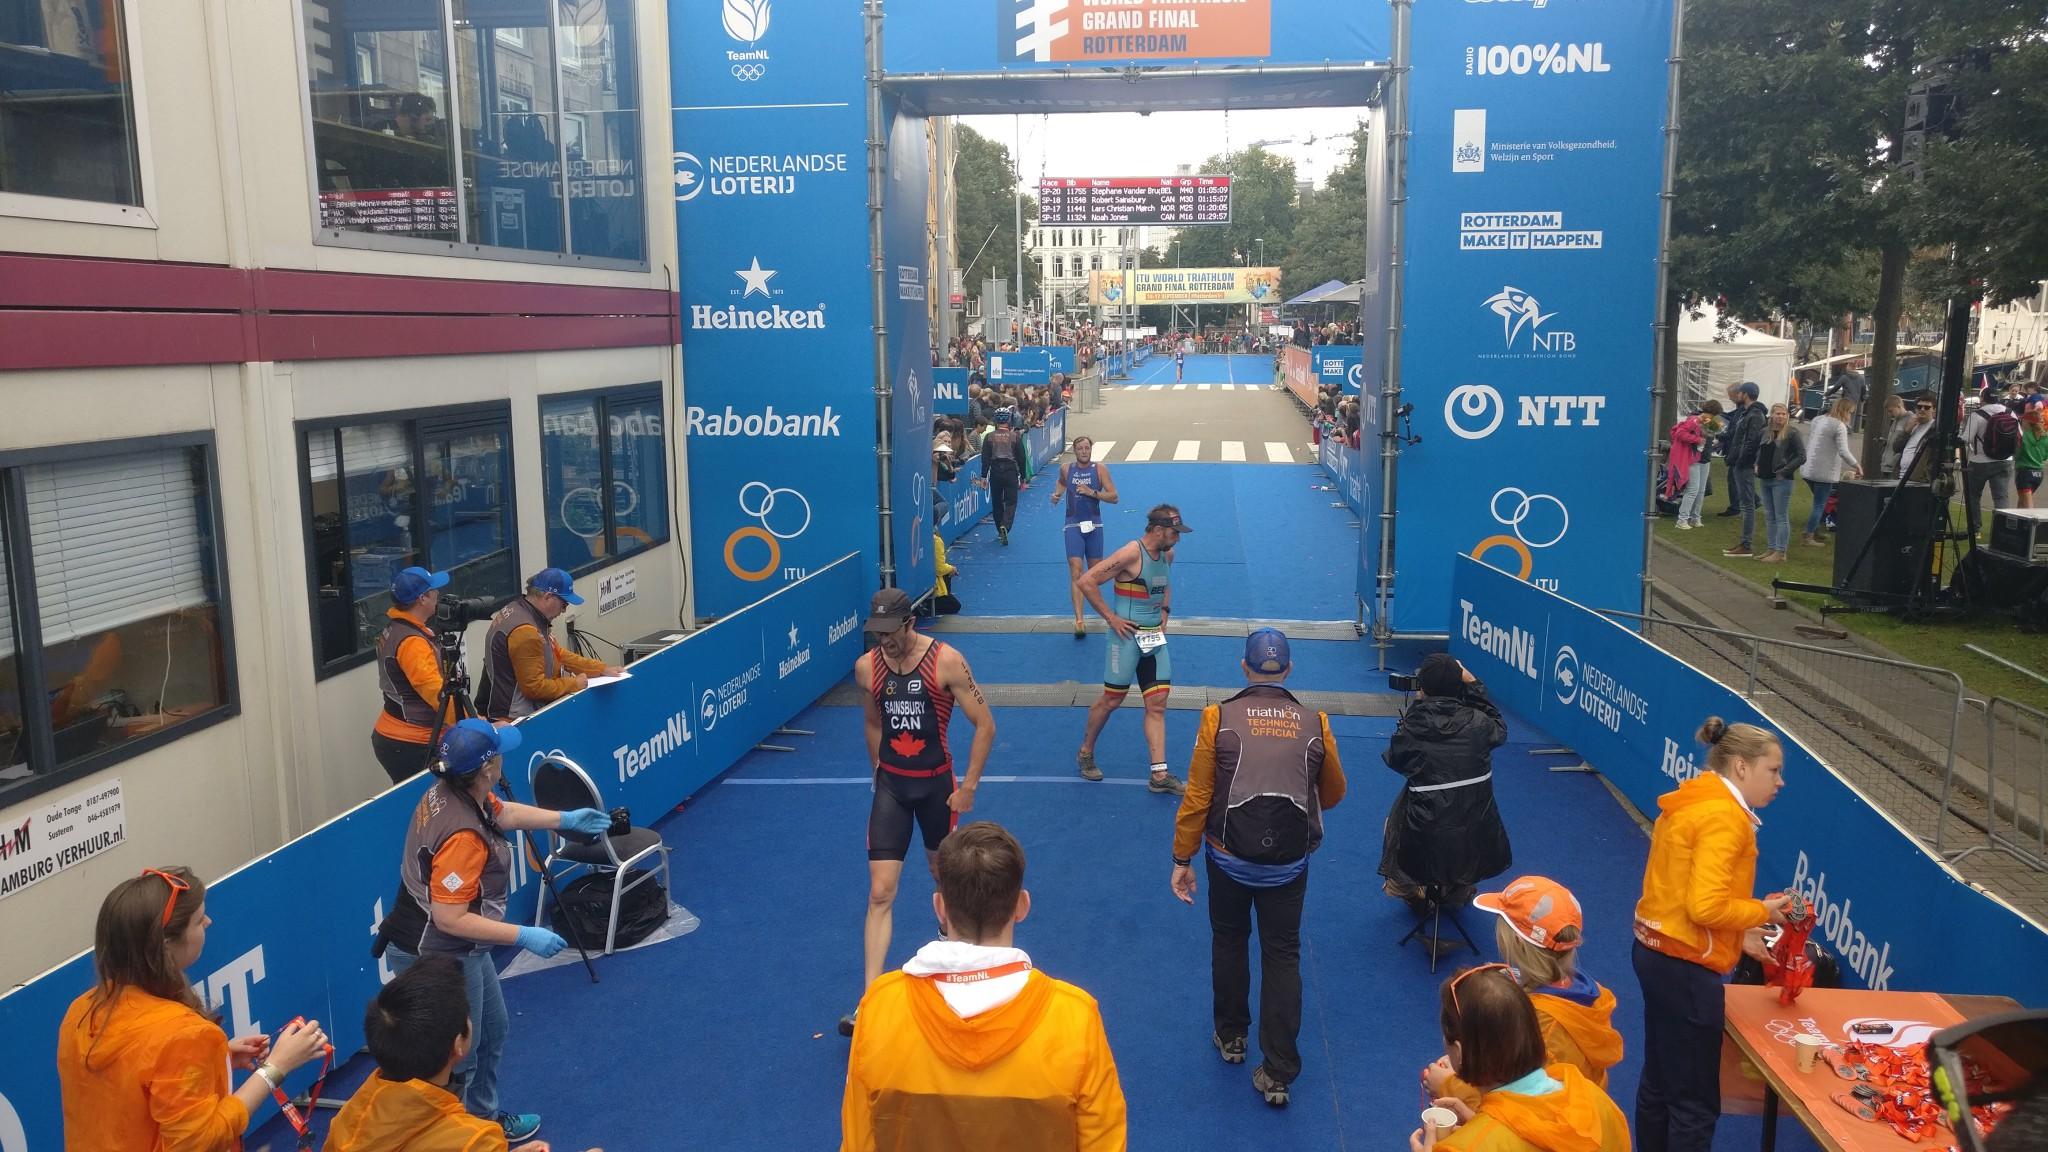 Stephane Van Der Bruggen Rotterdam finish